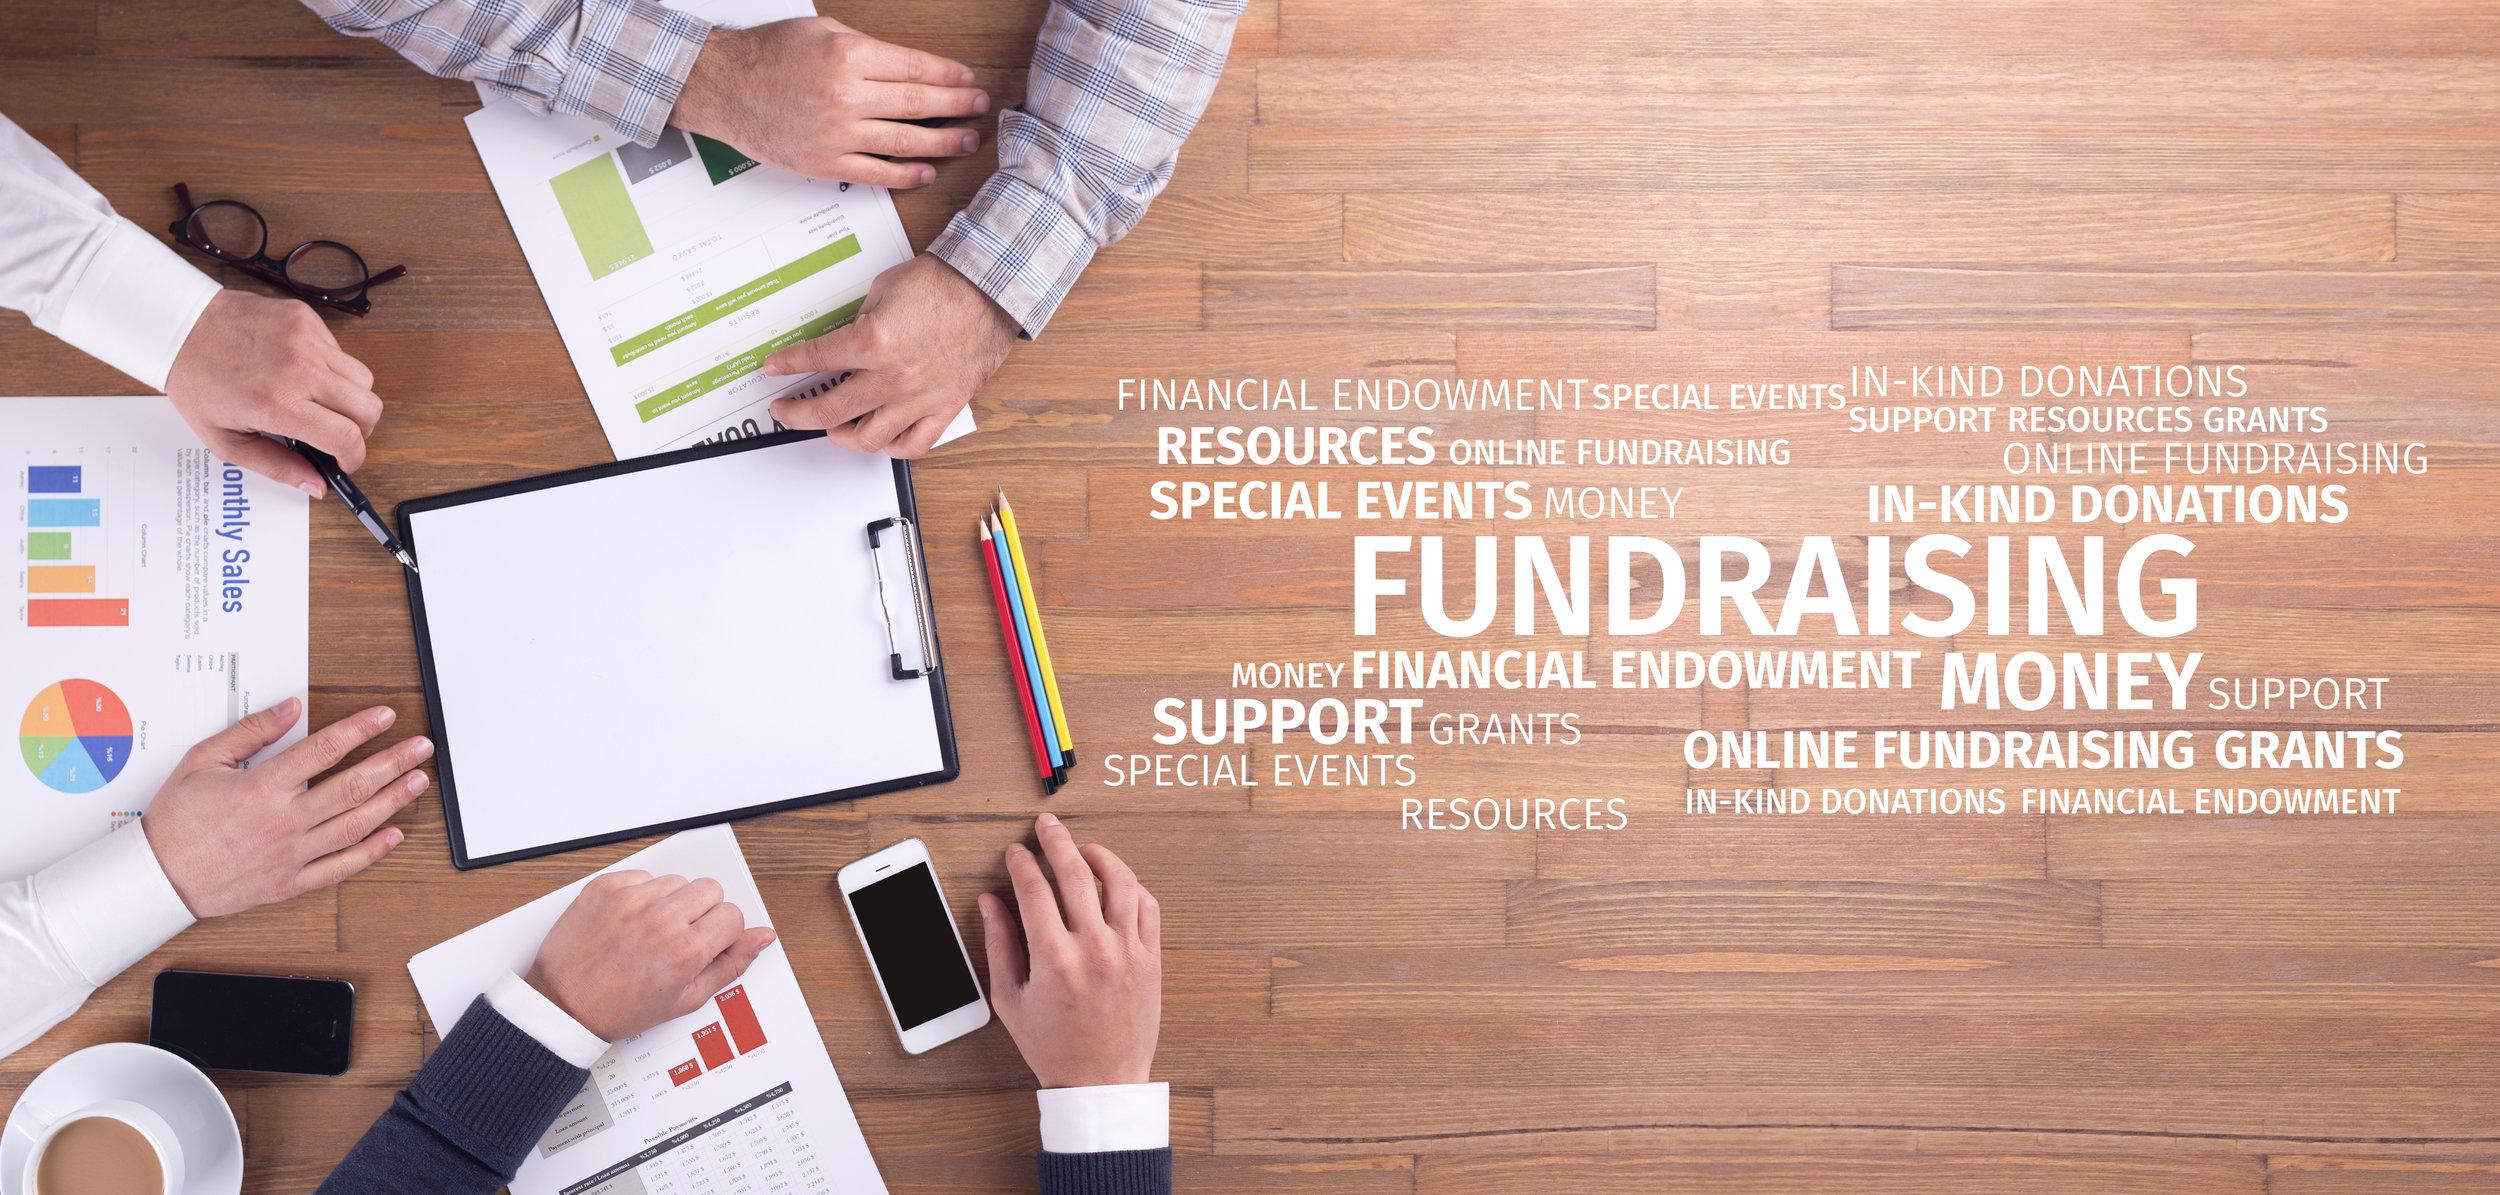 FundraisingHiRes.jpg